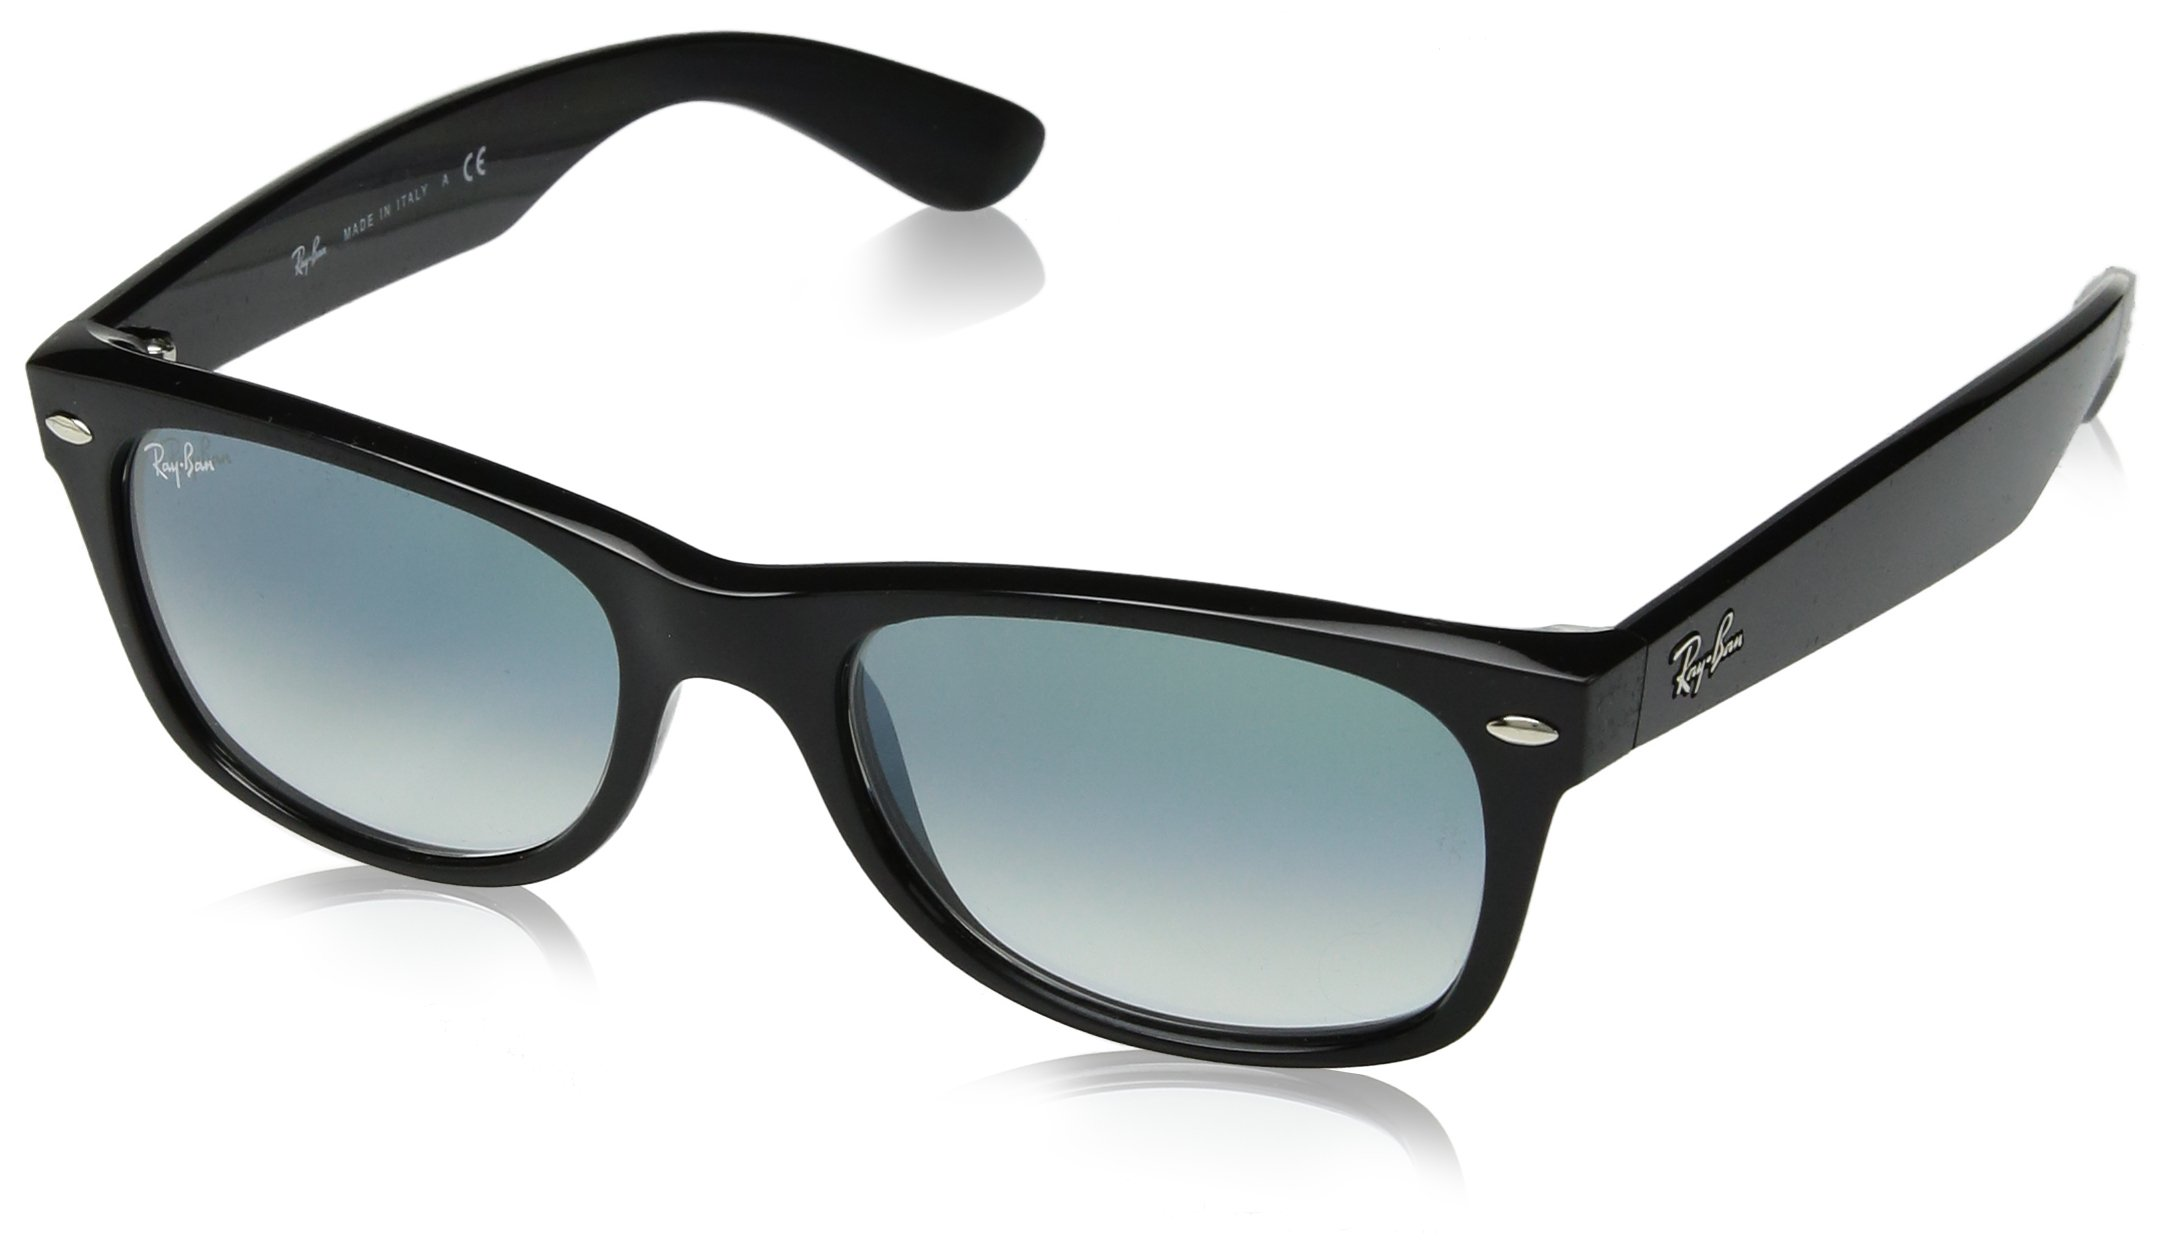 RAY-BAN RB2132 New Wayfarer Sunglasses, Black/Green Gradient, 52 mm by RAY-BAN